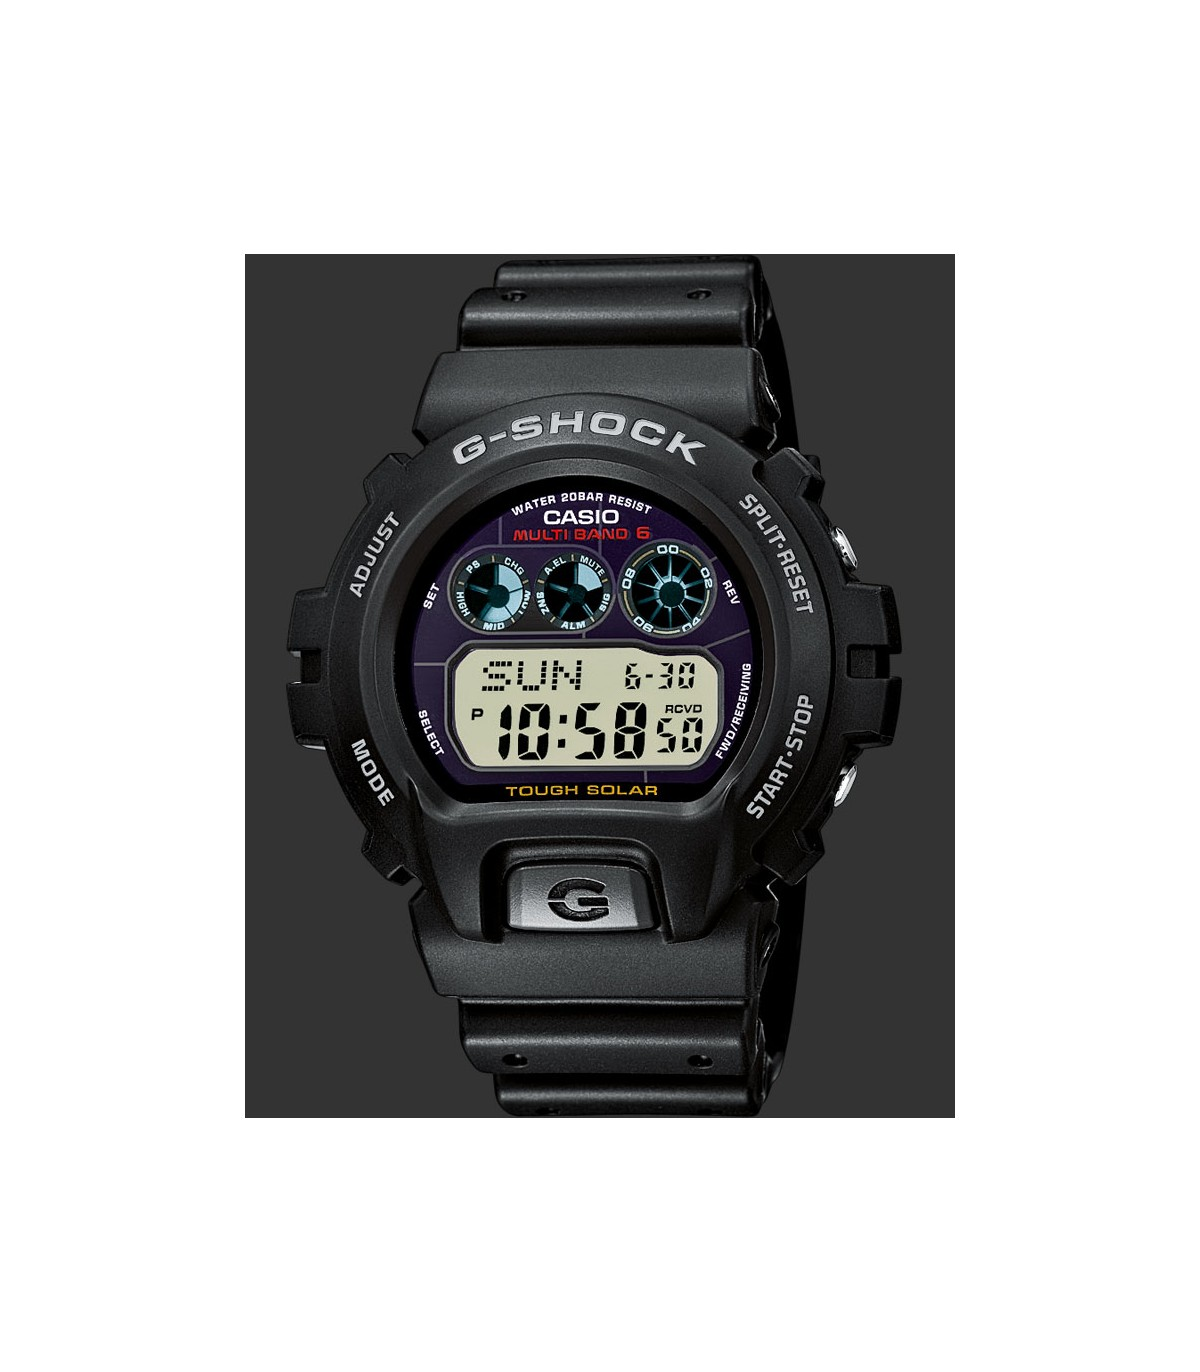 Reloj Hombre 1 Casio Radiocontrol Atomic World Shock G Gw Time 6900 w0On8kP